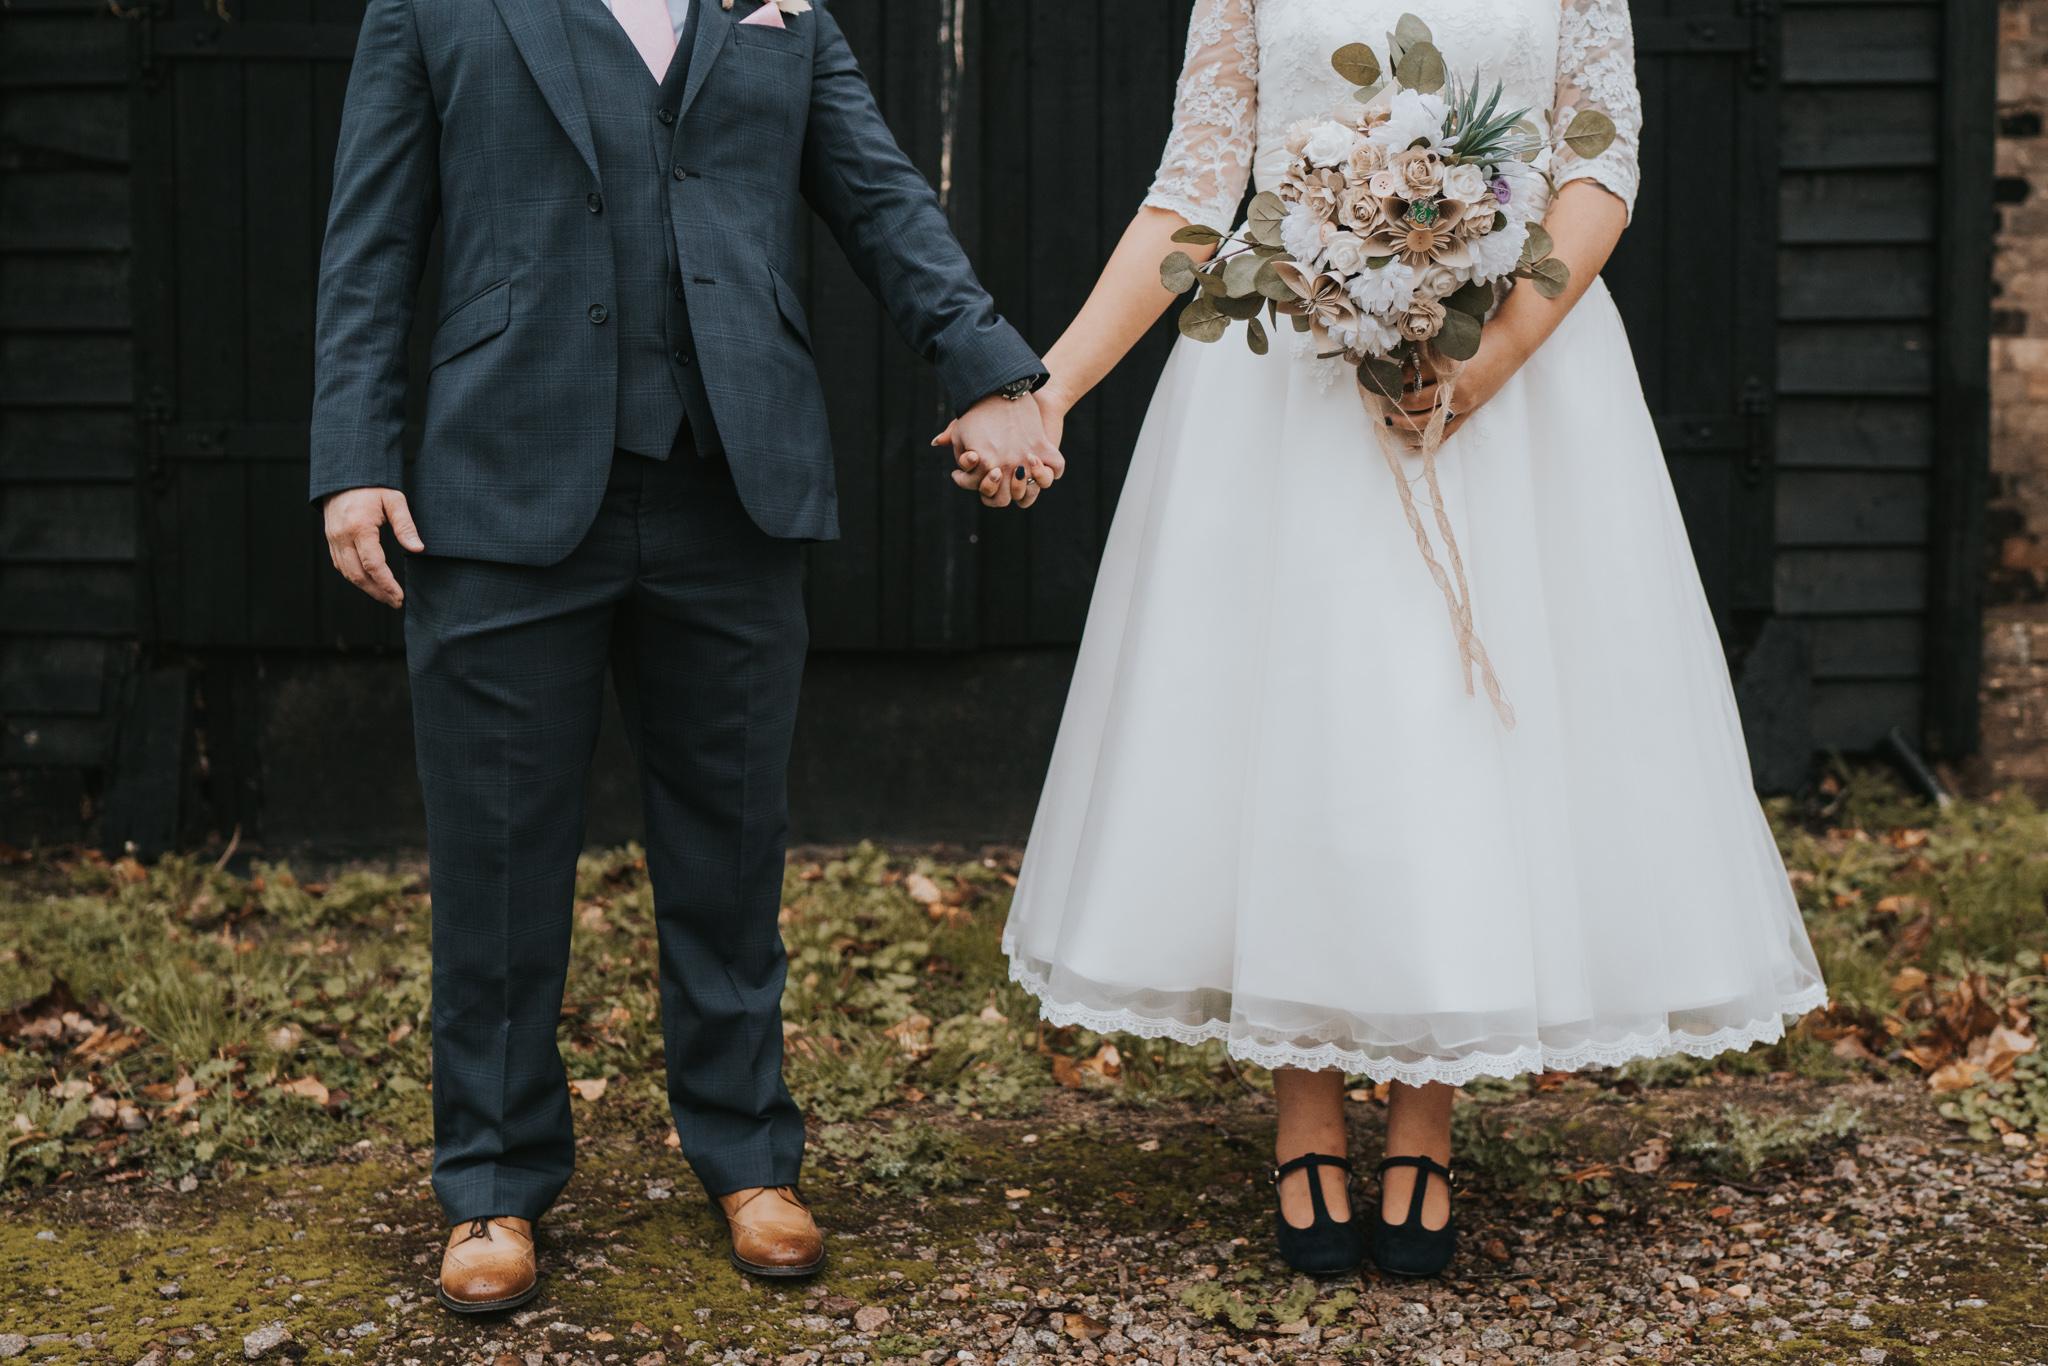 rhia-james-rustic-crabbs-barn-vintage-50s-retro-wedding-grace-elizabeth-colchester-essex-alternative-relaxed-wedding-family-photography-devon-suffolk-norfolk-essex (83 of 138).jpg